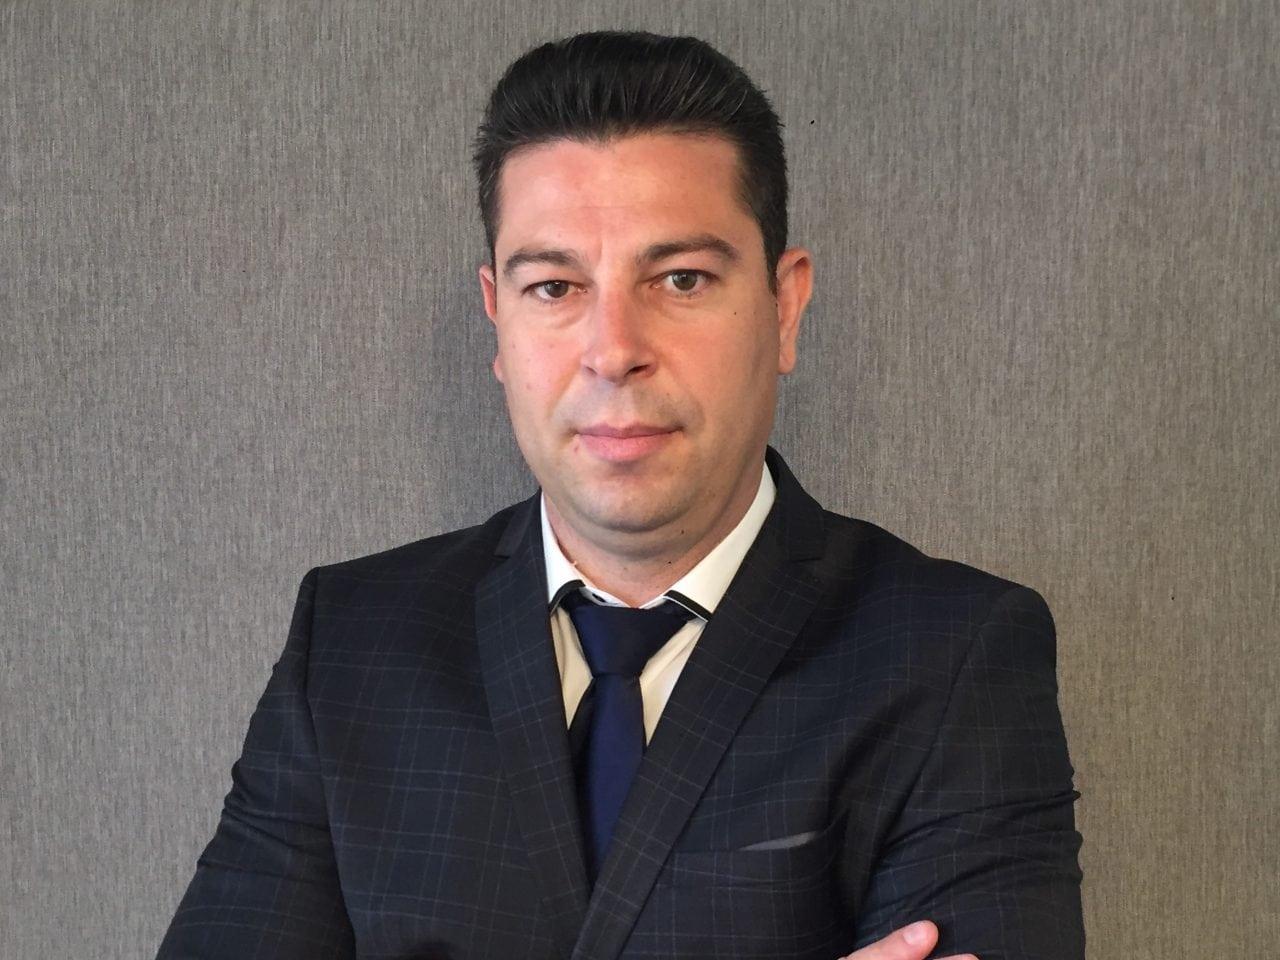 Vasile Mocanu - Facilitec Romania are un nou director general